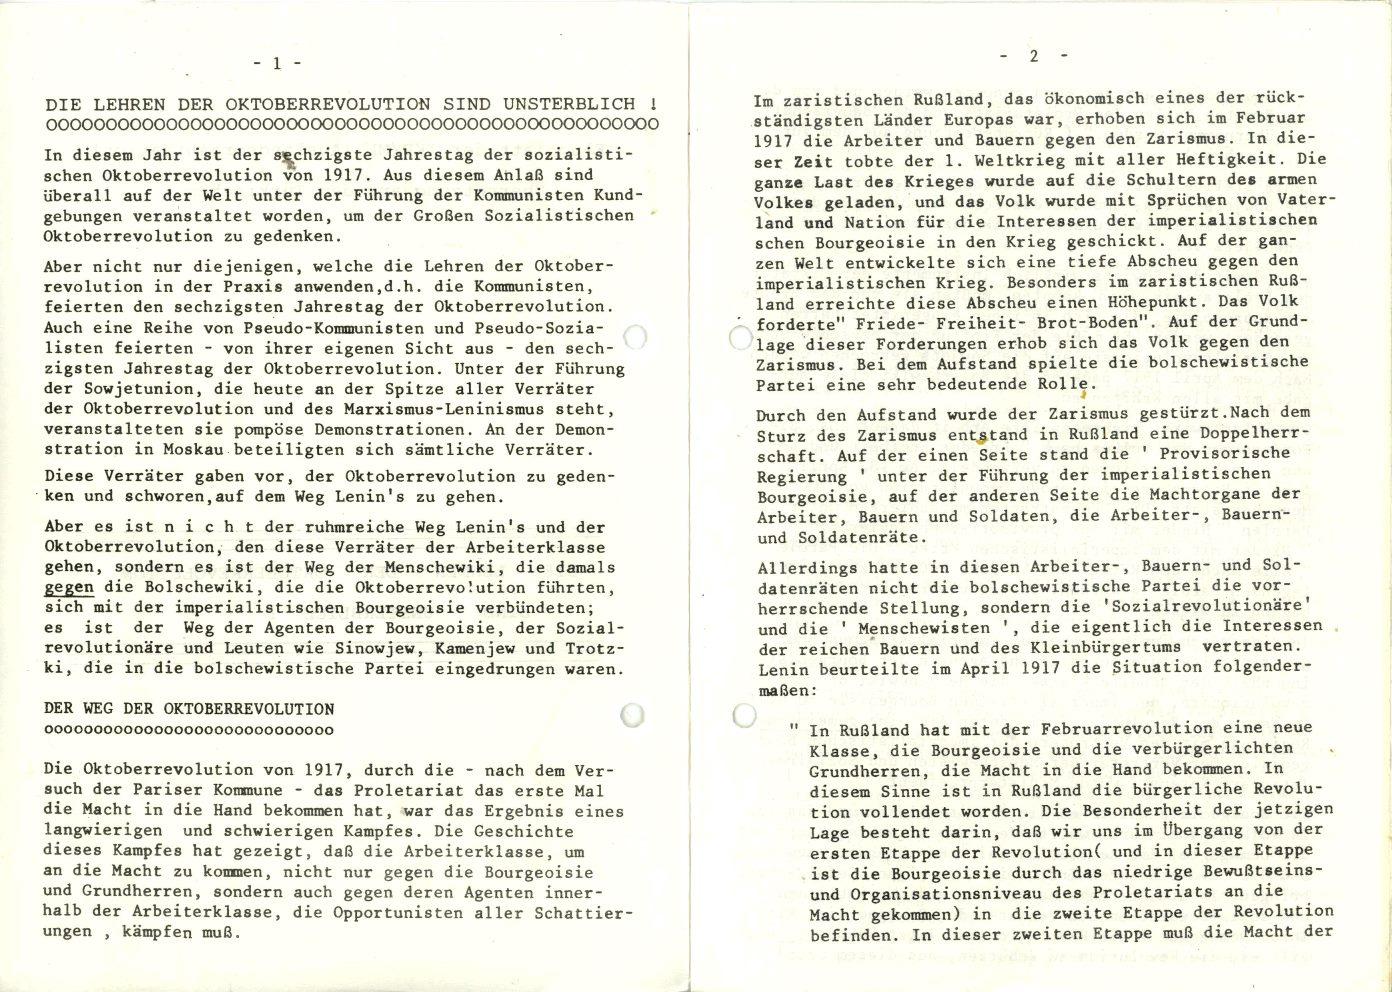 TKPML_1977_05_02